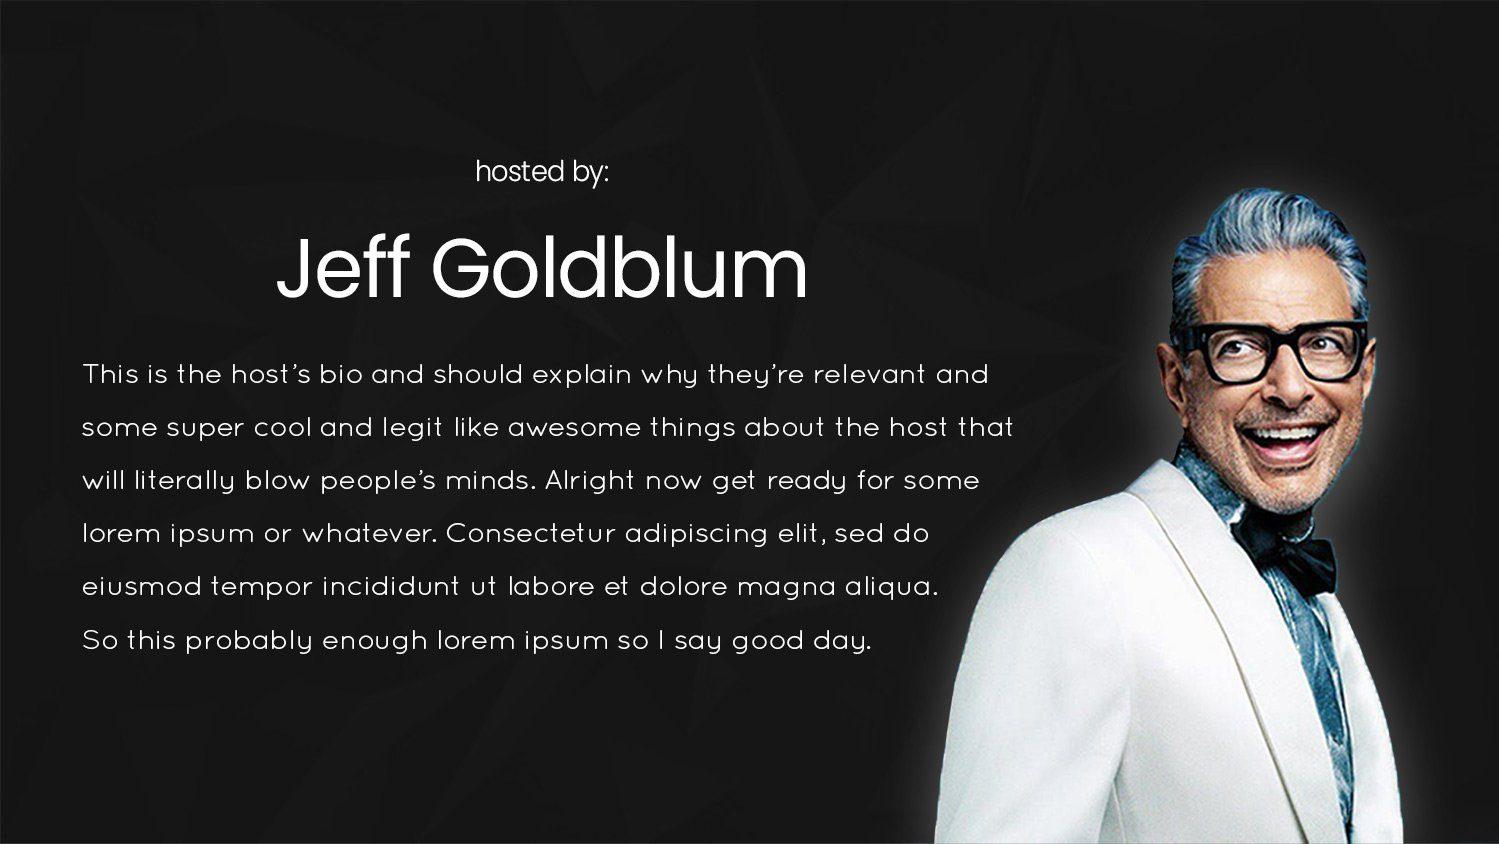 podcasting pitch deck host bio